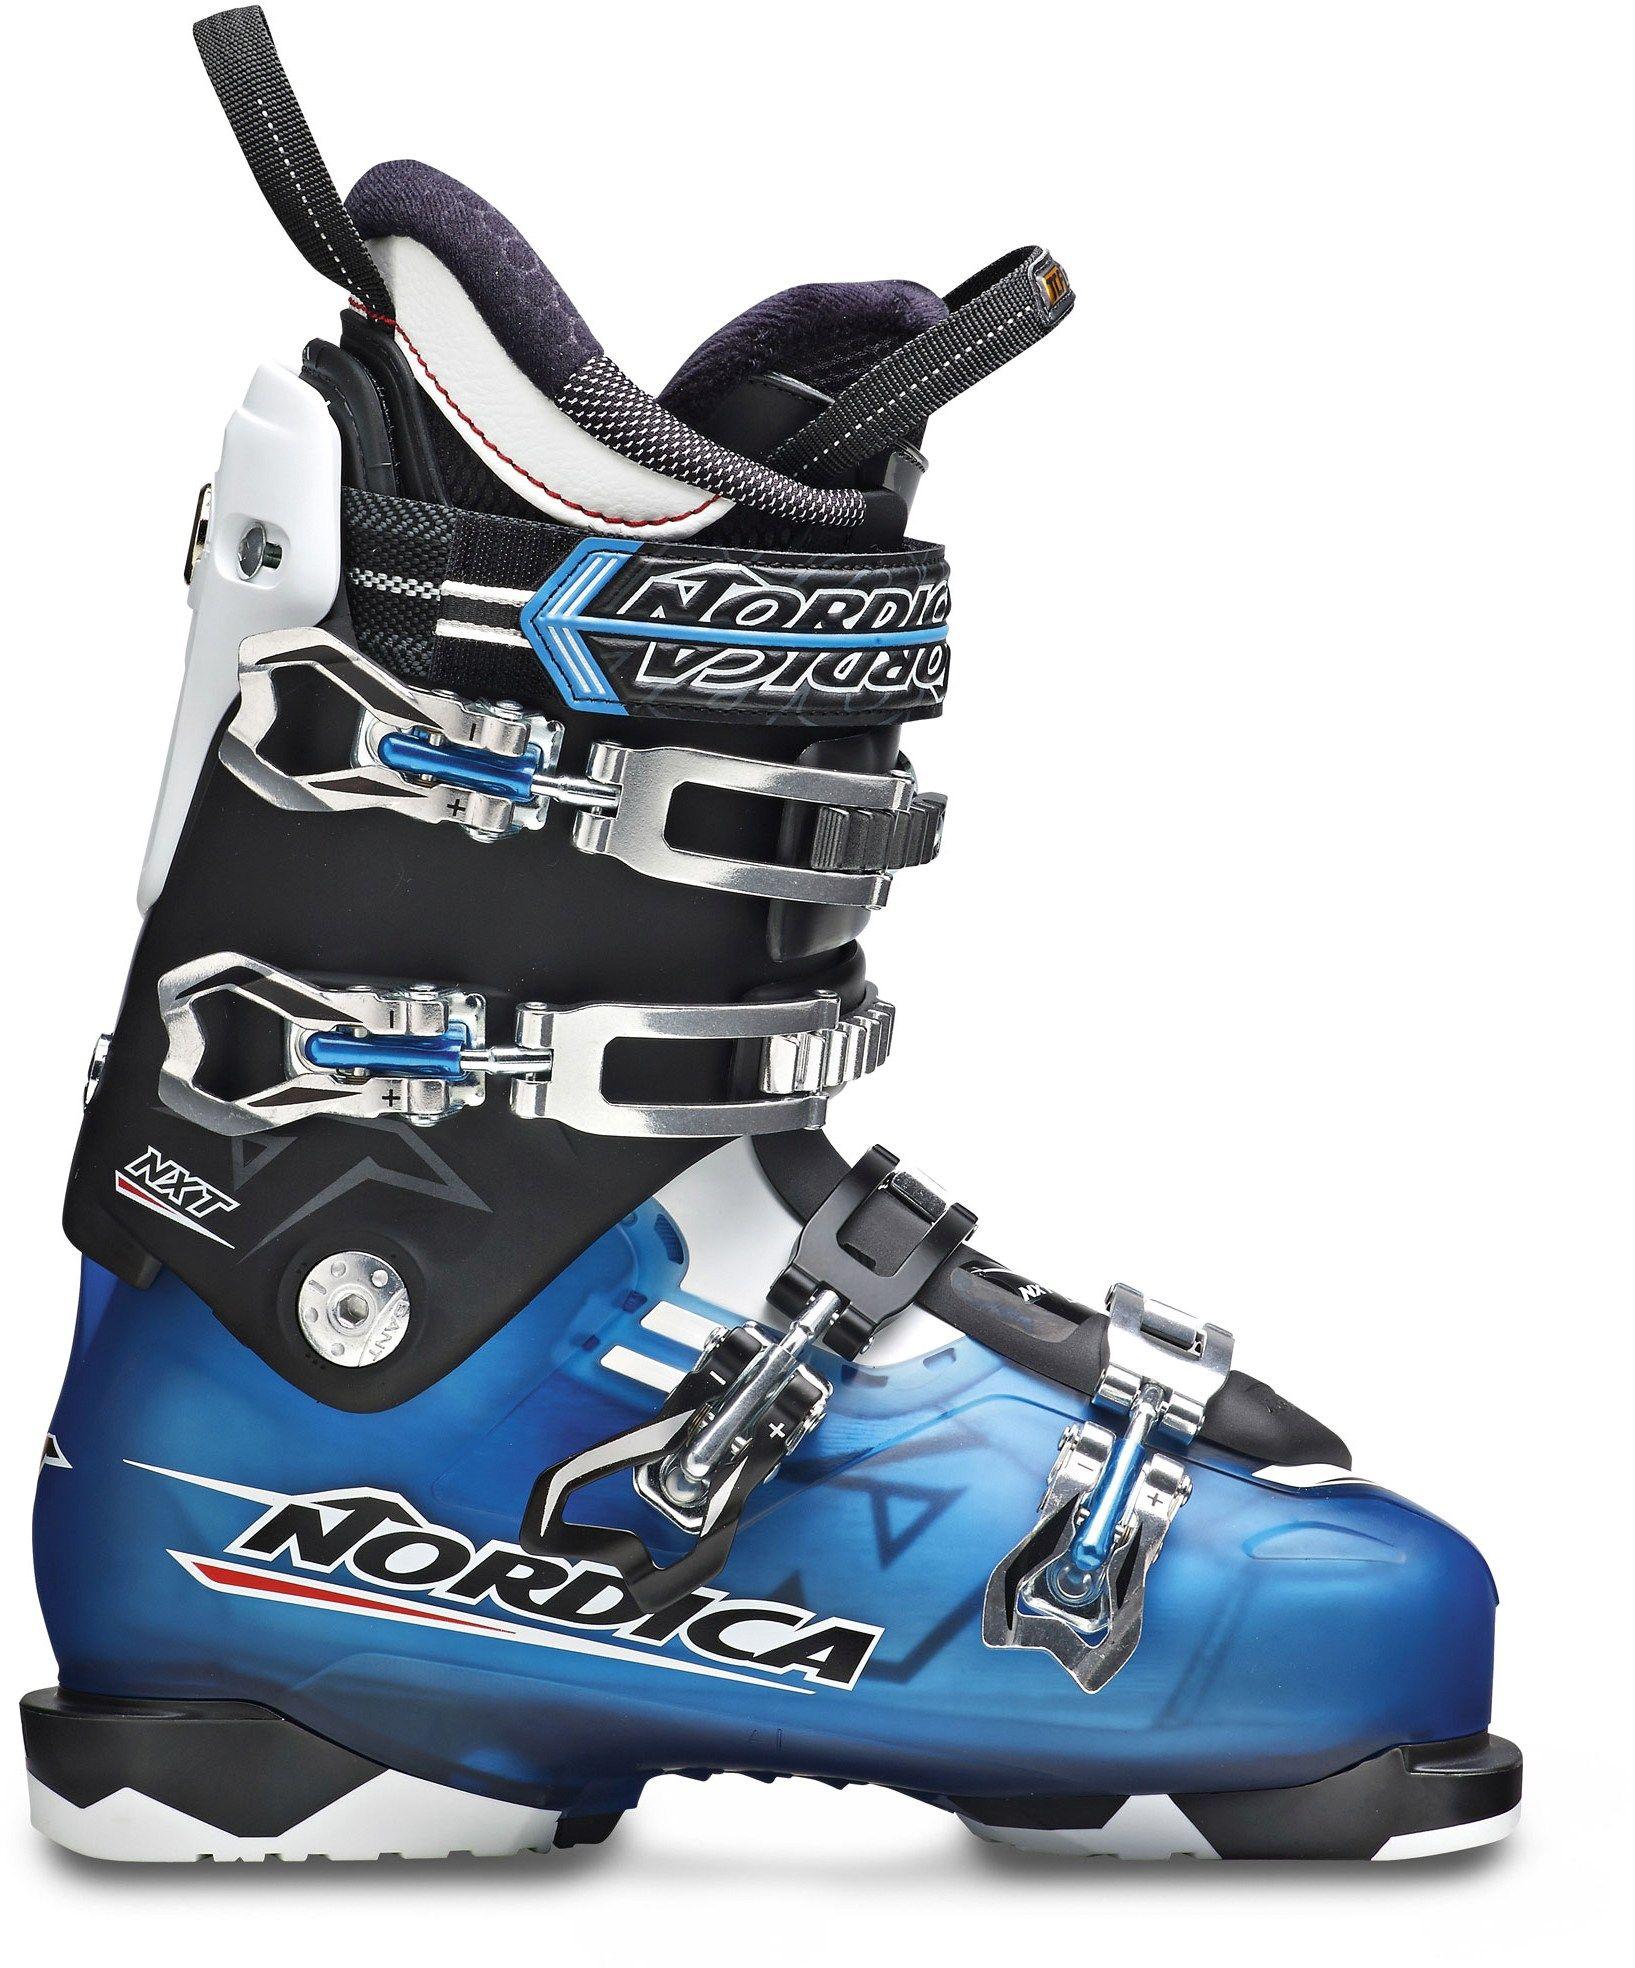 c01884997ba Nordica NXT N2 Ski Boots - Men's - 2015/2016   REI Co-op   *Sporting ...